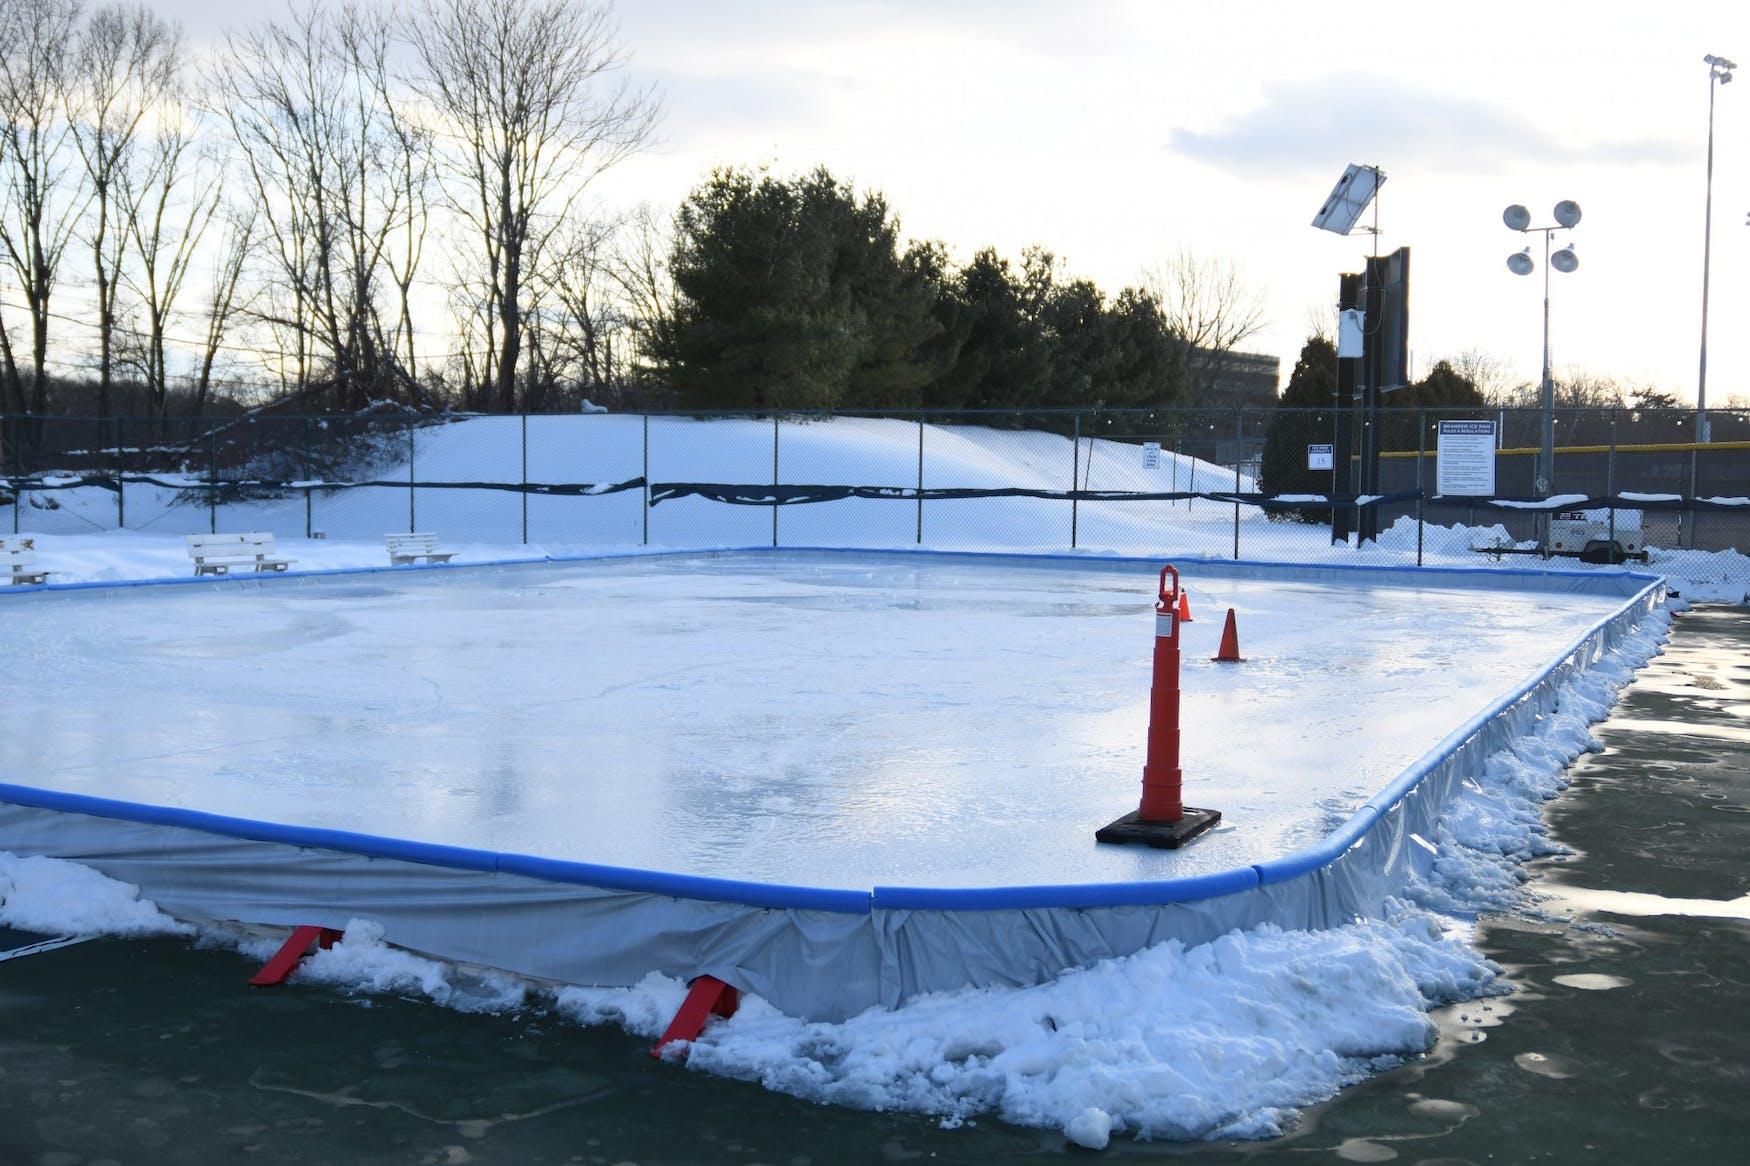 New_Ice_Skating_Rink_Gosman_2